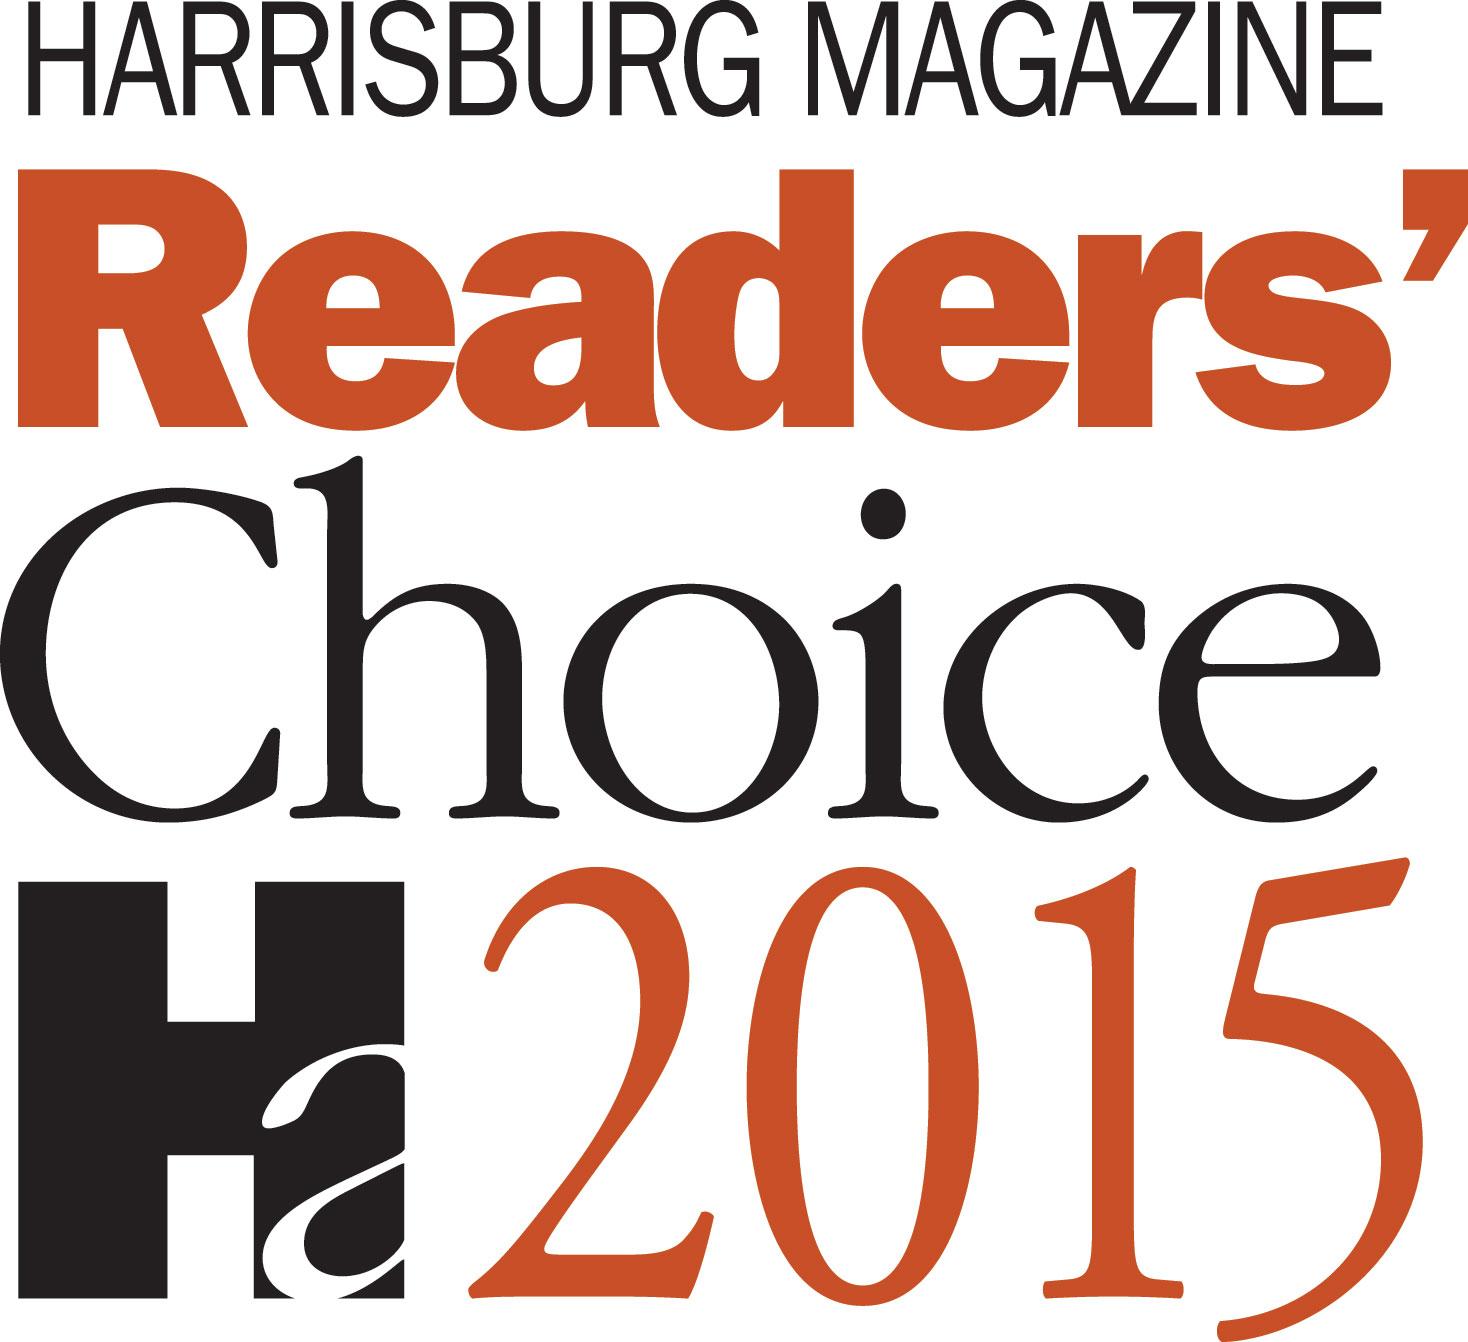 CWA Awarded Harrisburg Magazine\'s Readers\' Choice 2015 - Conte ...